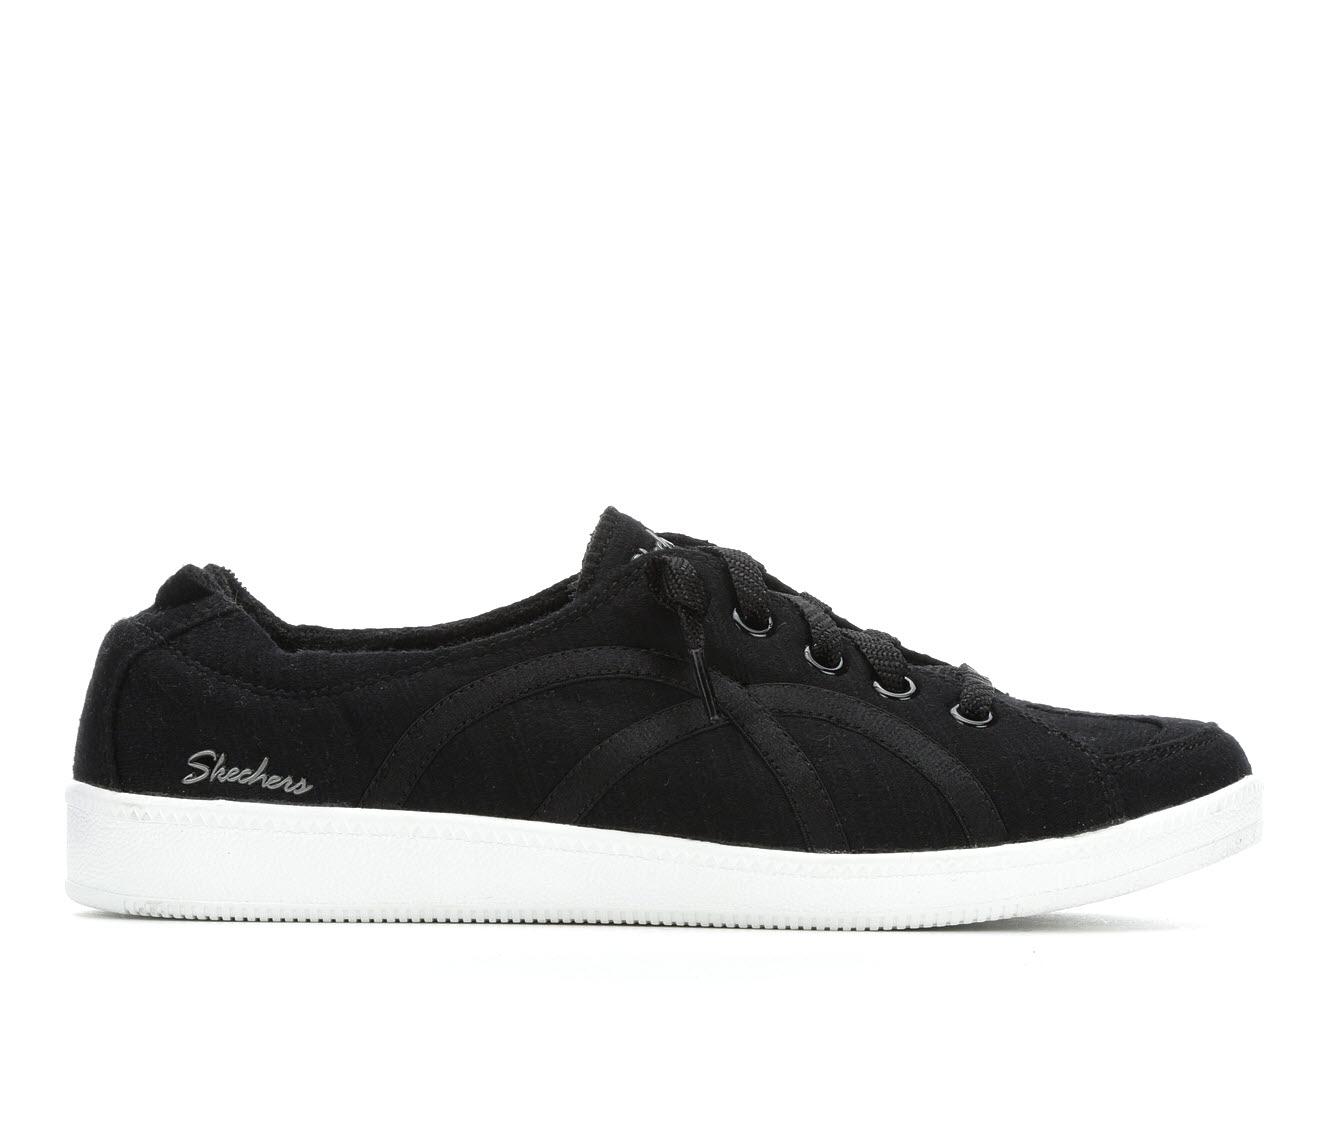 Skechers Take A Walk 23958 Women's Shoe (Black Canvas)